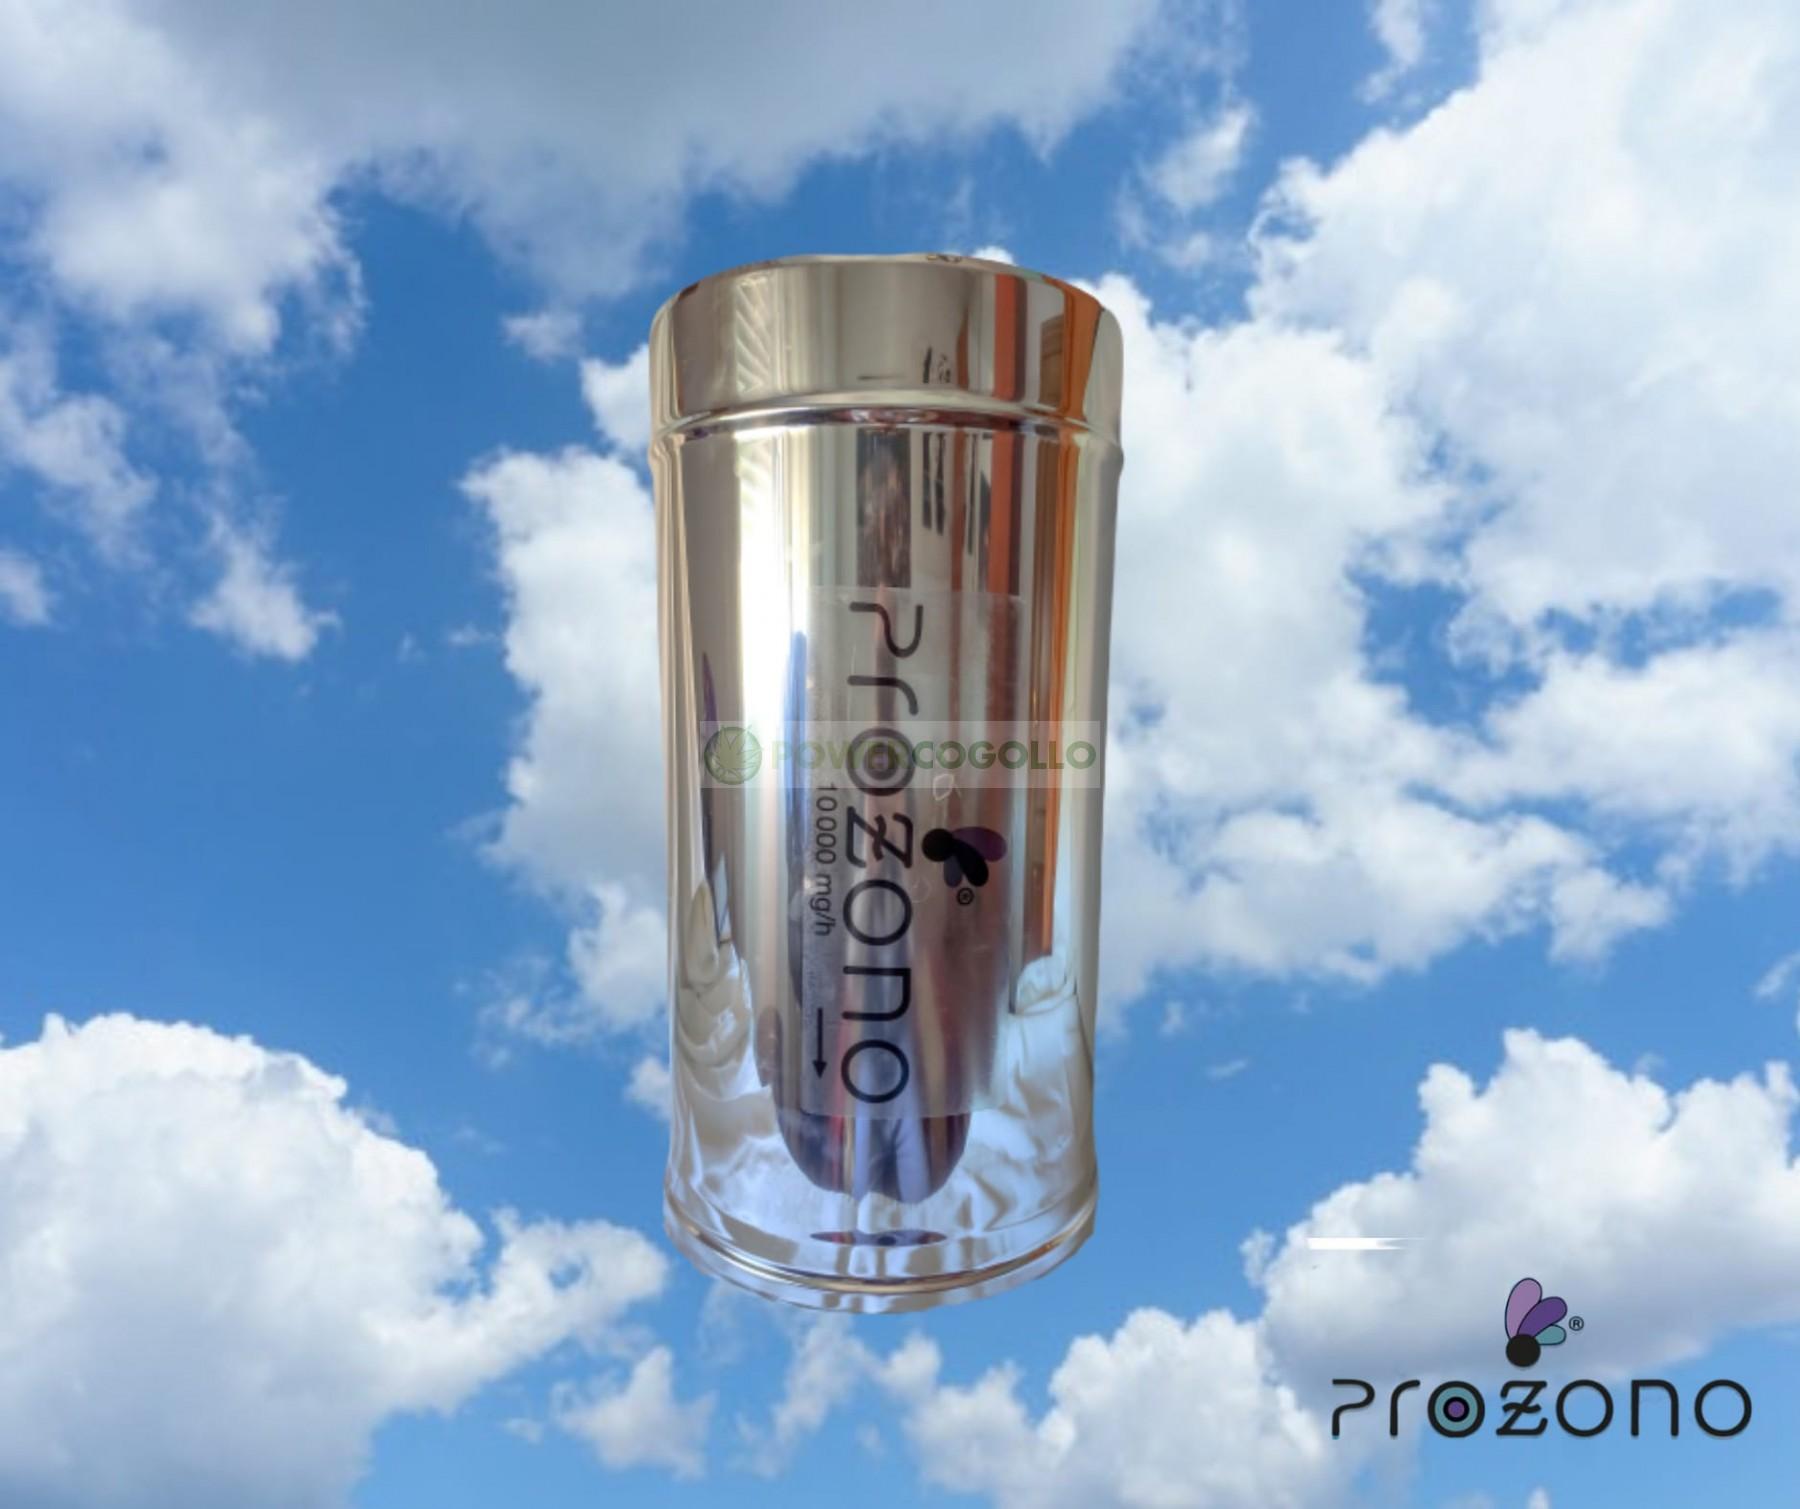 Ozonizador Prozono de Conducto 250mm 7000mg/h 0